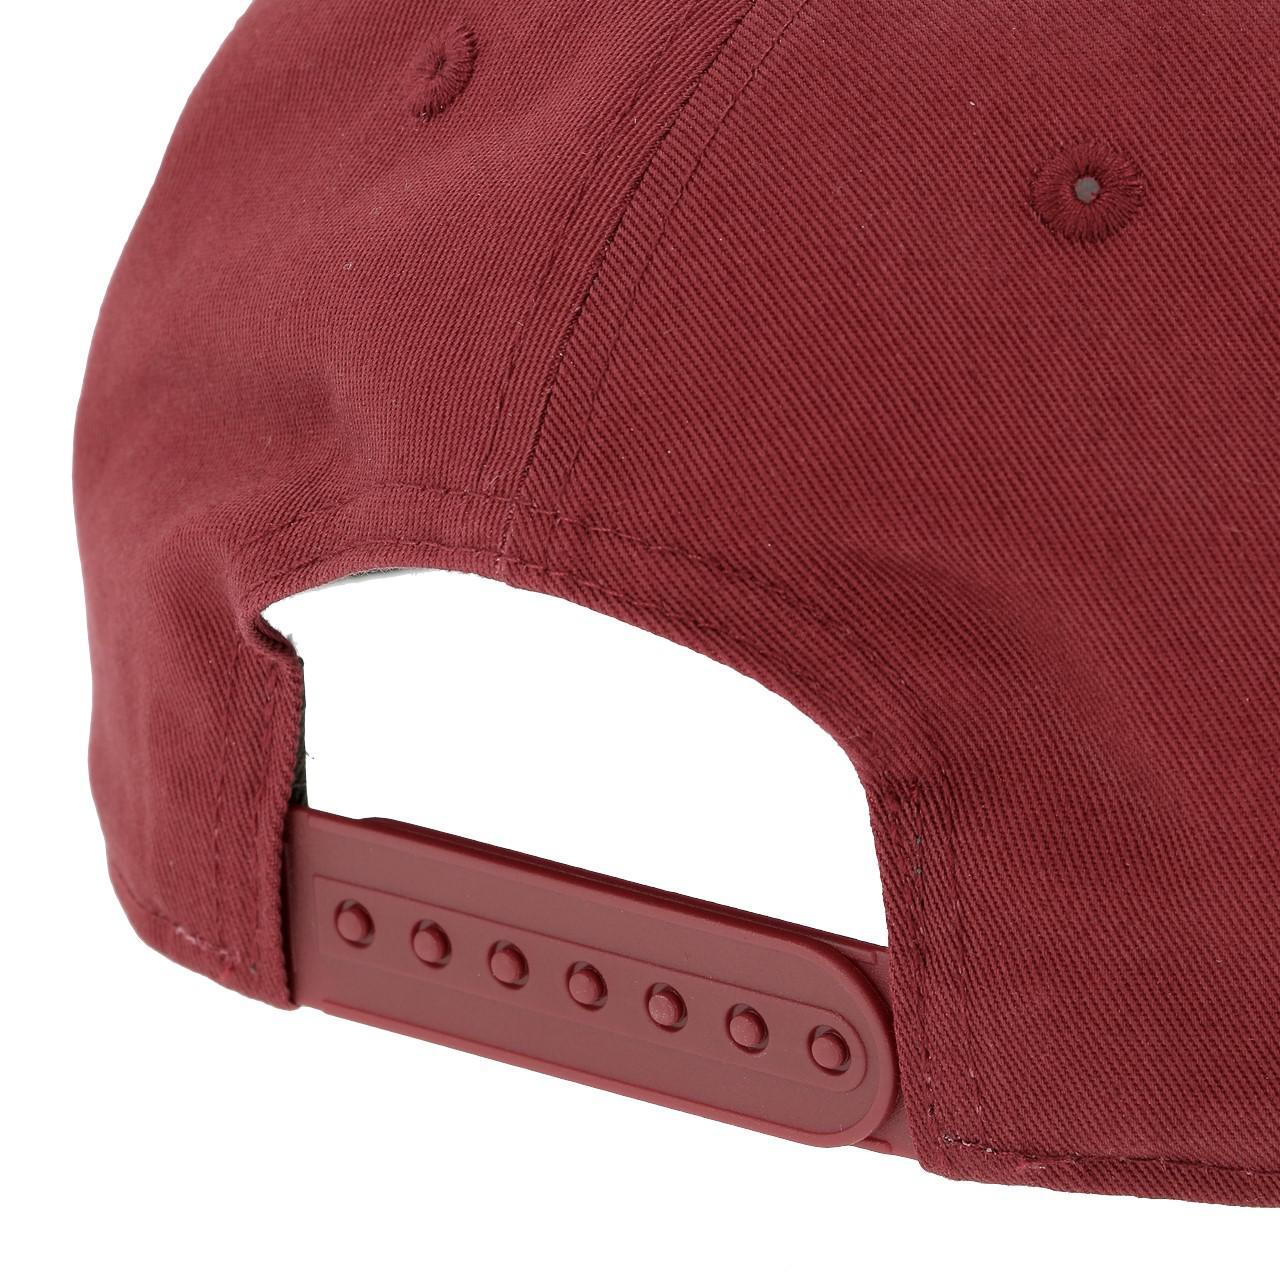 Cap-American-Puma-Arsenal-Cap-Dbx-Khaki-Red-12777-New thumbnail 2